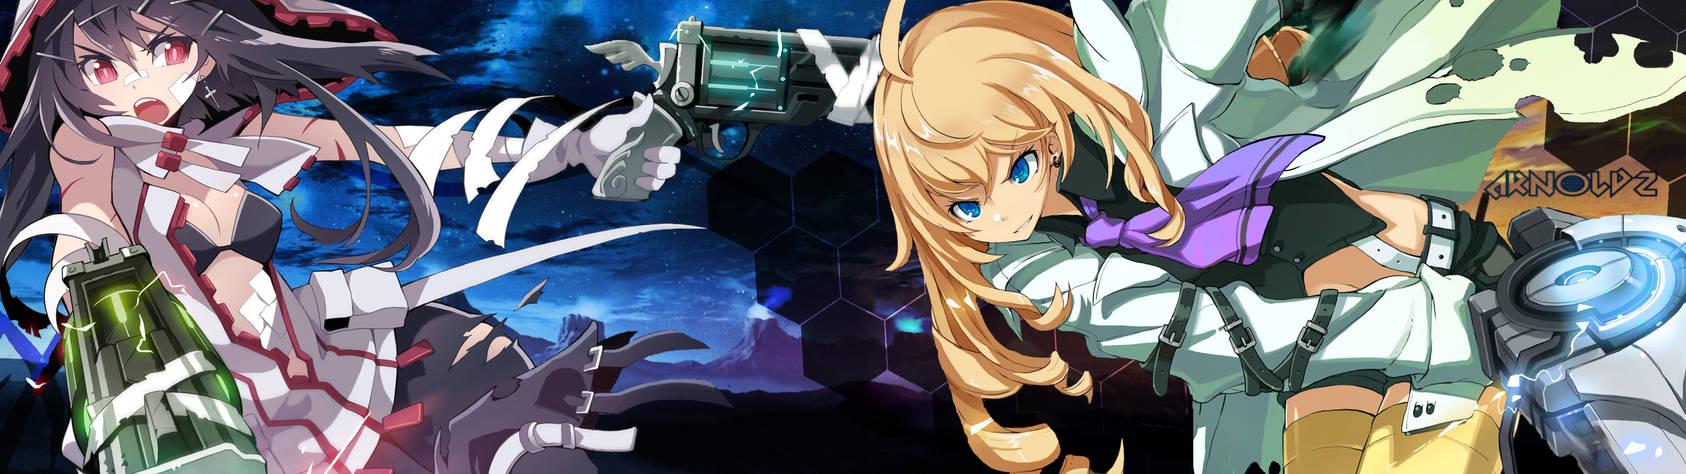 Anime Girls Dual Screen/Moniter [3840x1080] by iarnoldz ...